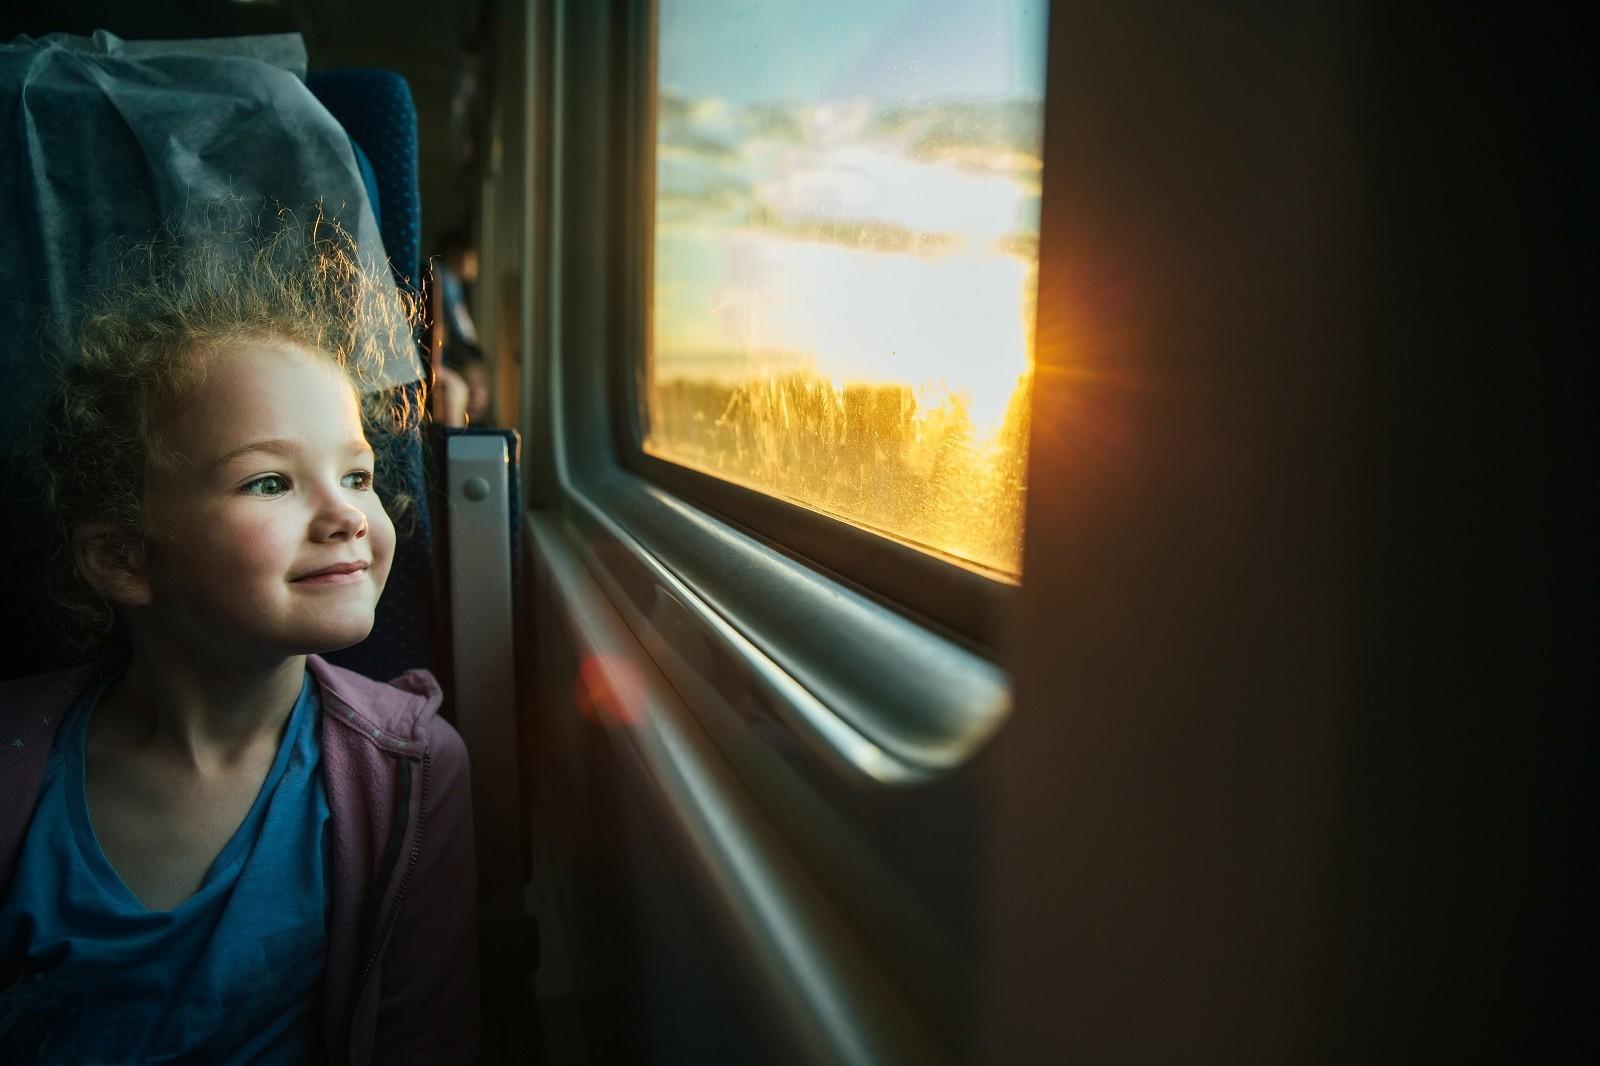 train_enfant_shutterstock.jpg